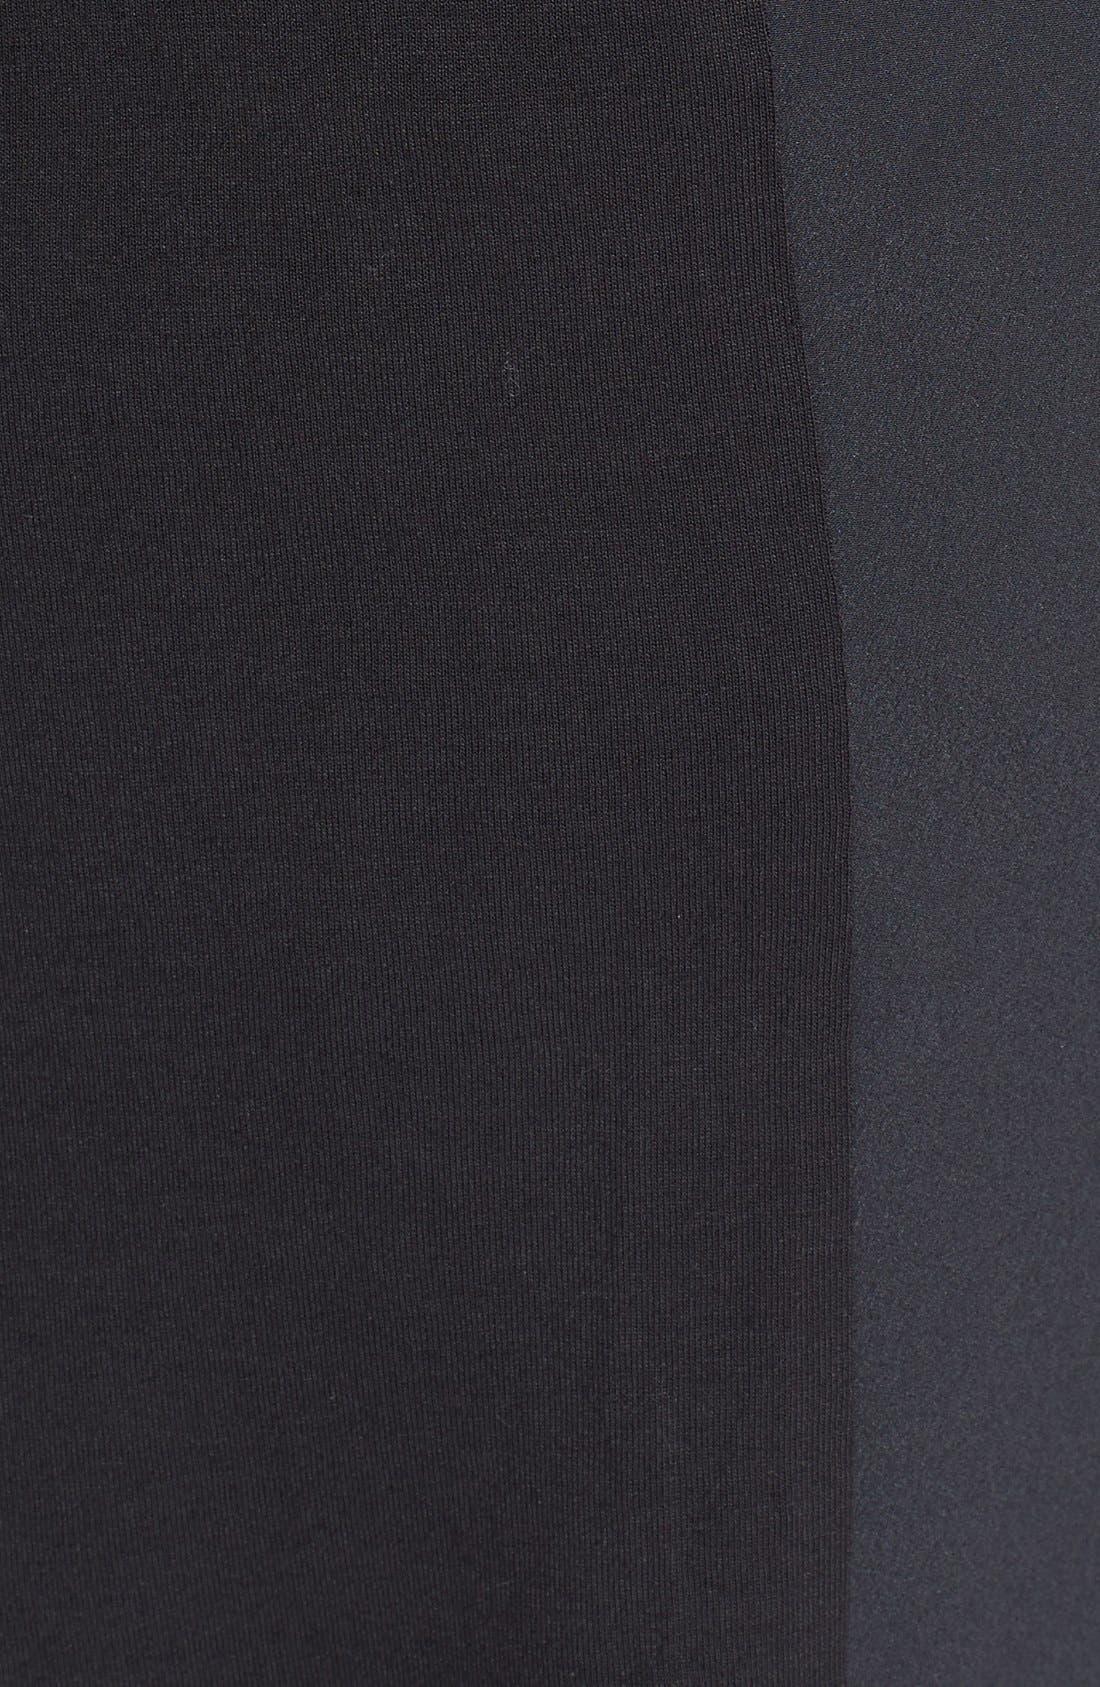 Alternate Image 3  - DKNYC Half Placket Shirtdress (Plus Size)